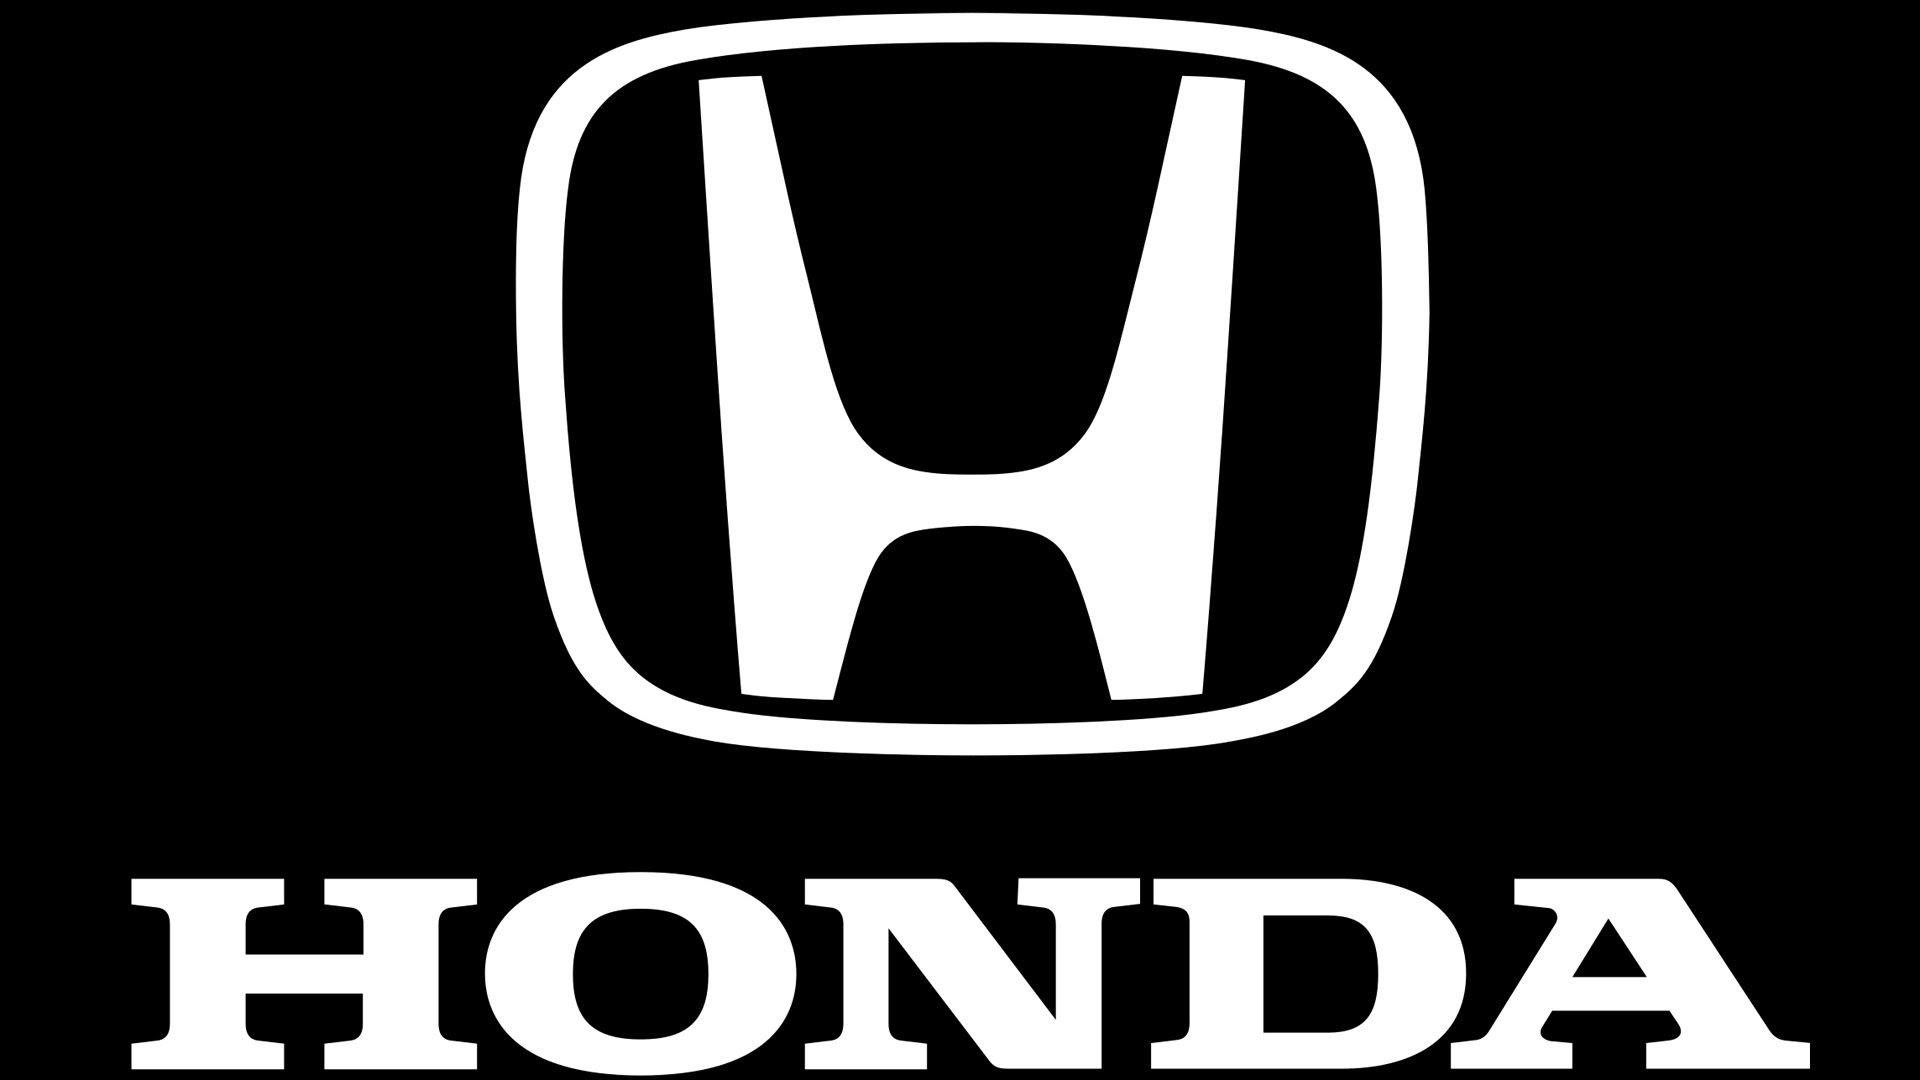 Honda Logo, Honda Symbol, Meaning, History and Evolution